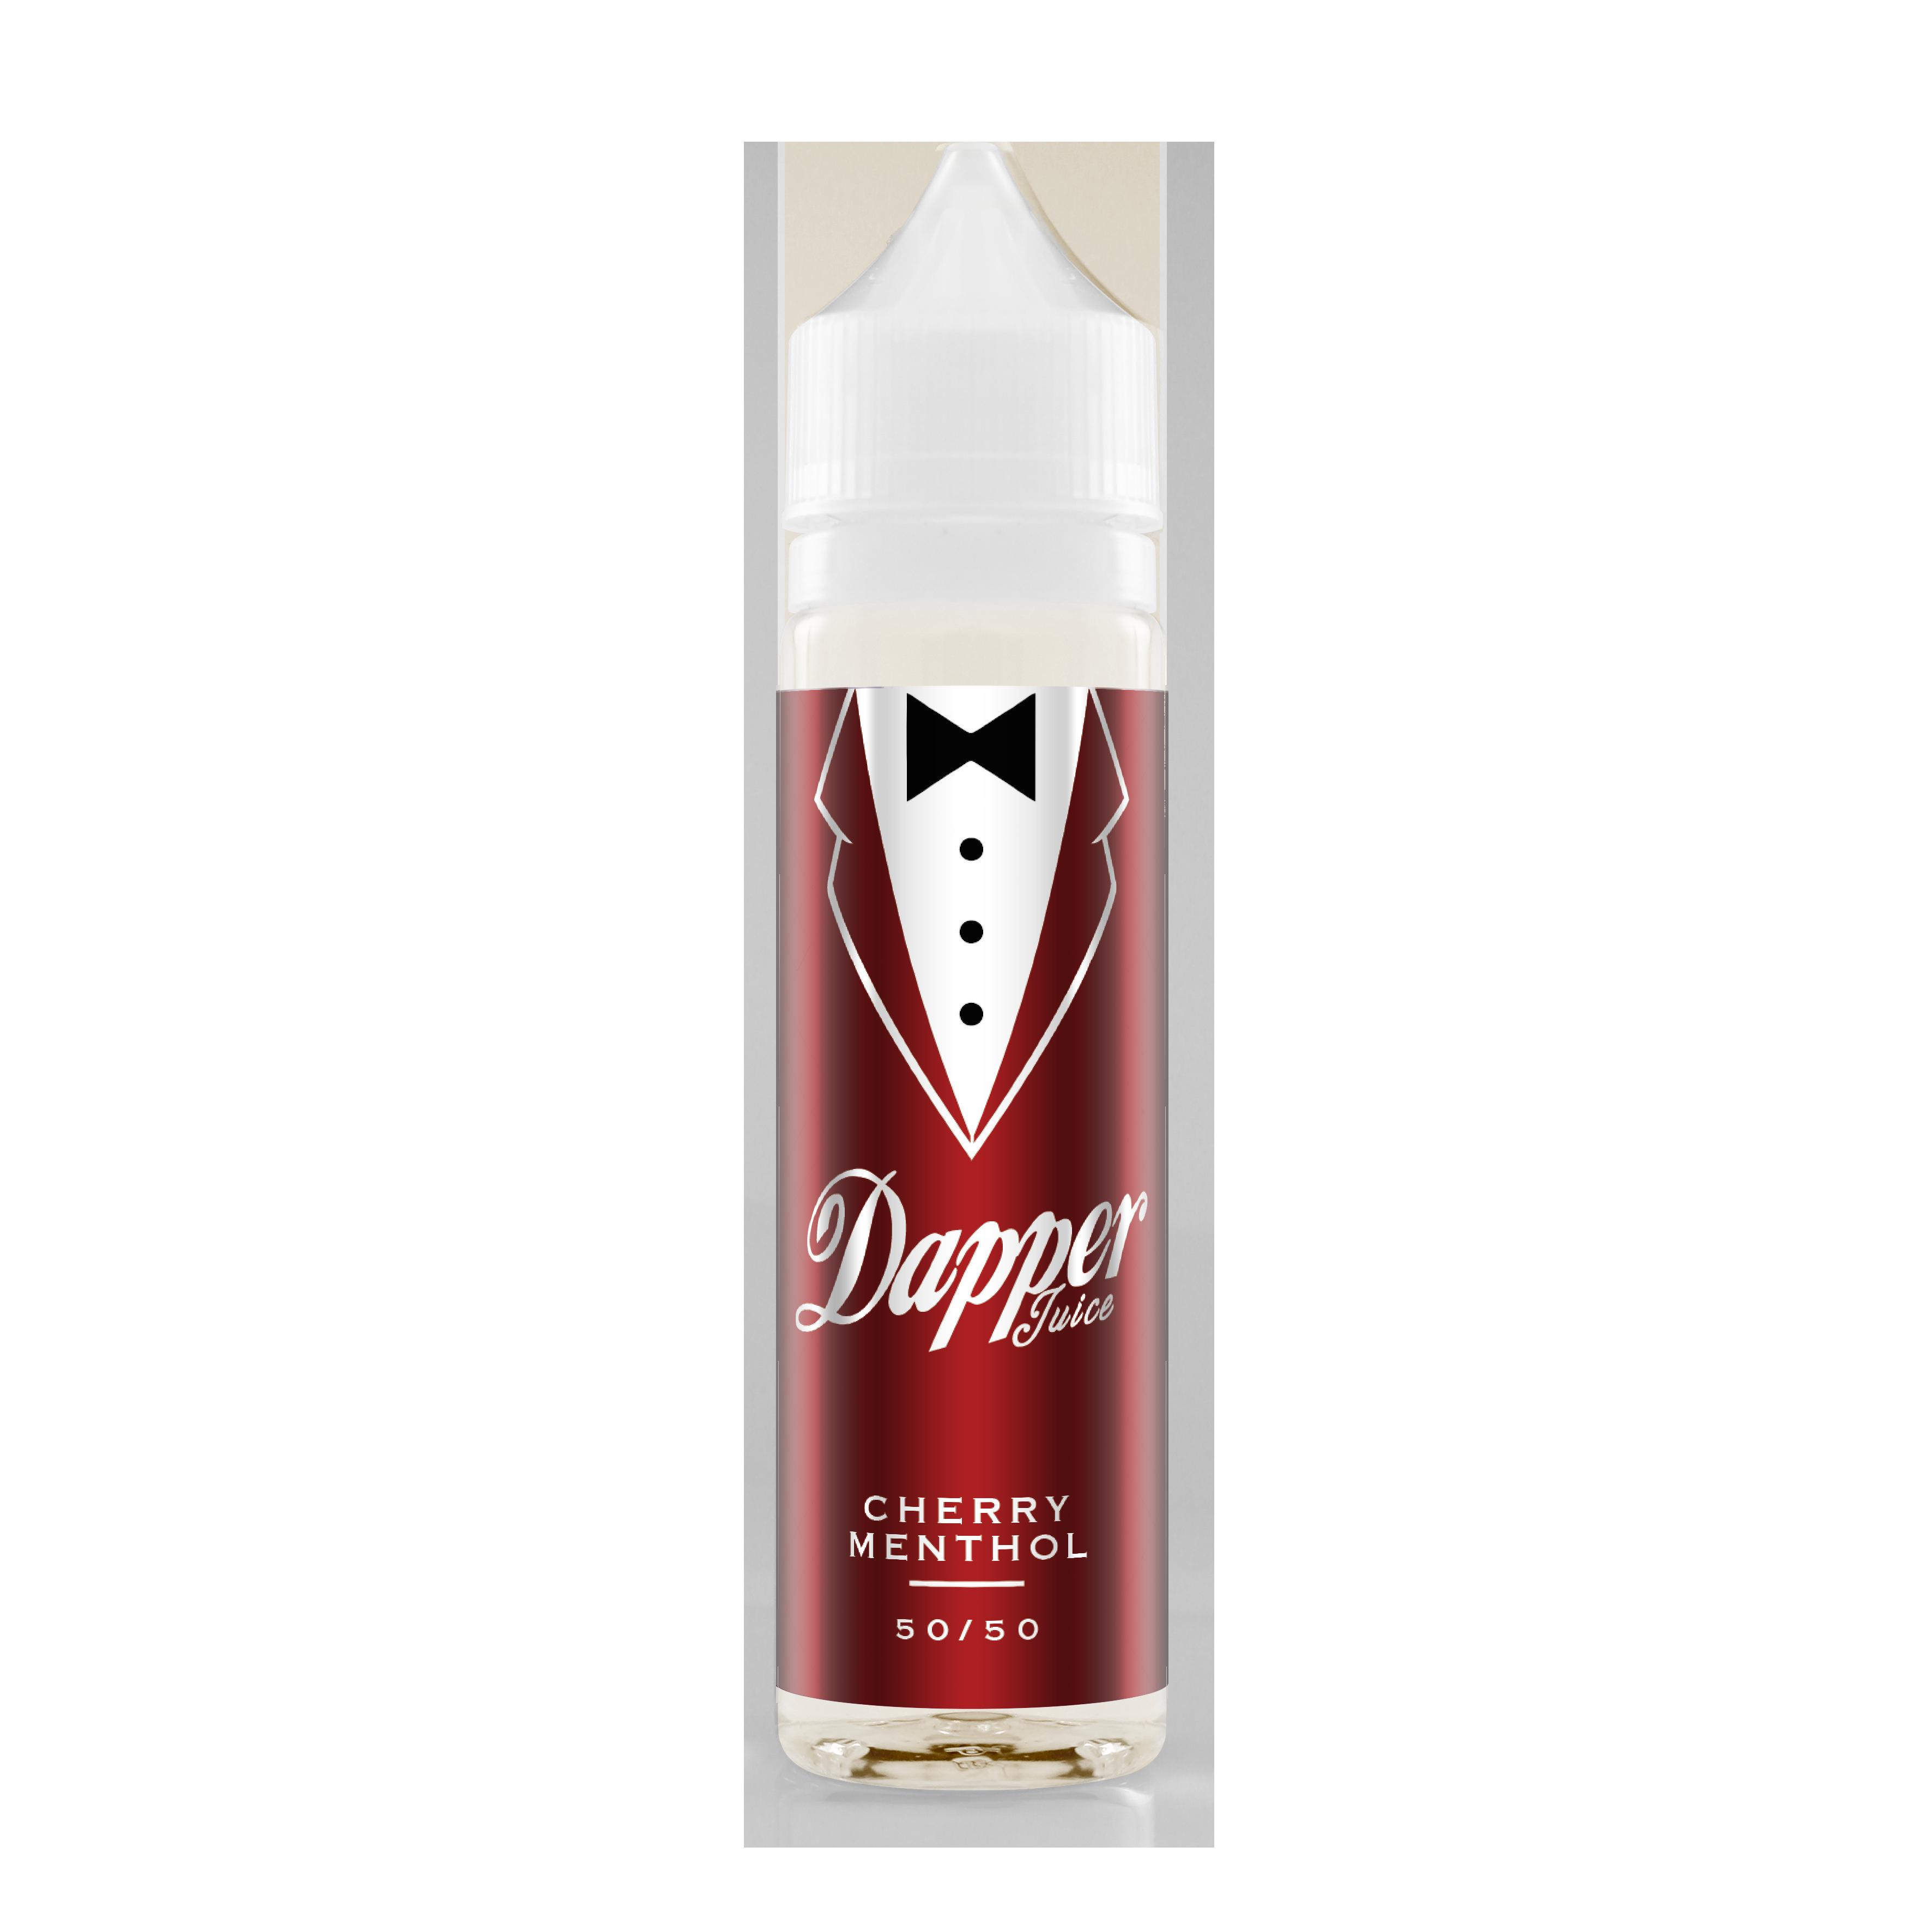 Cherry Menthol - Dapper...